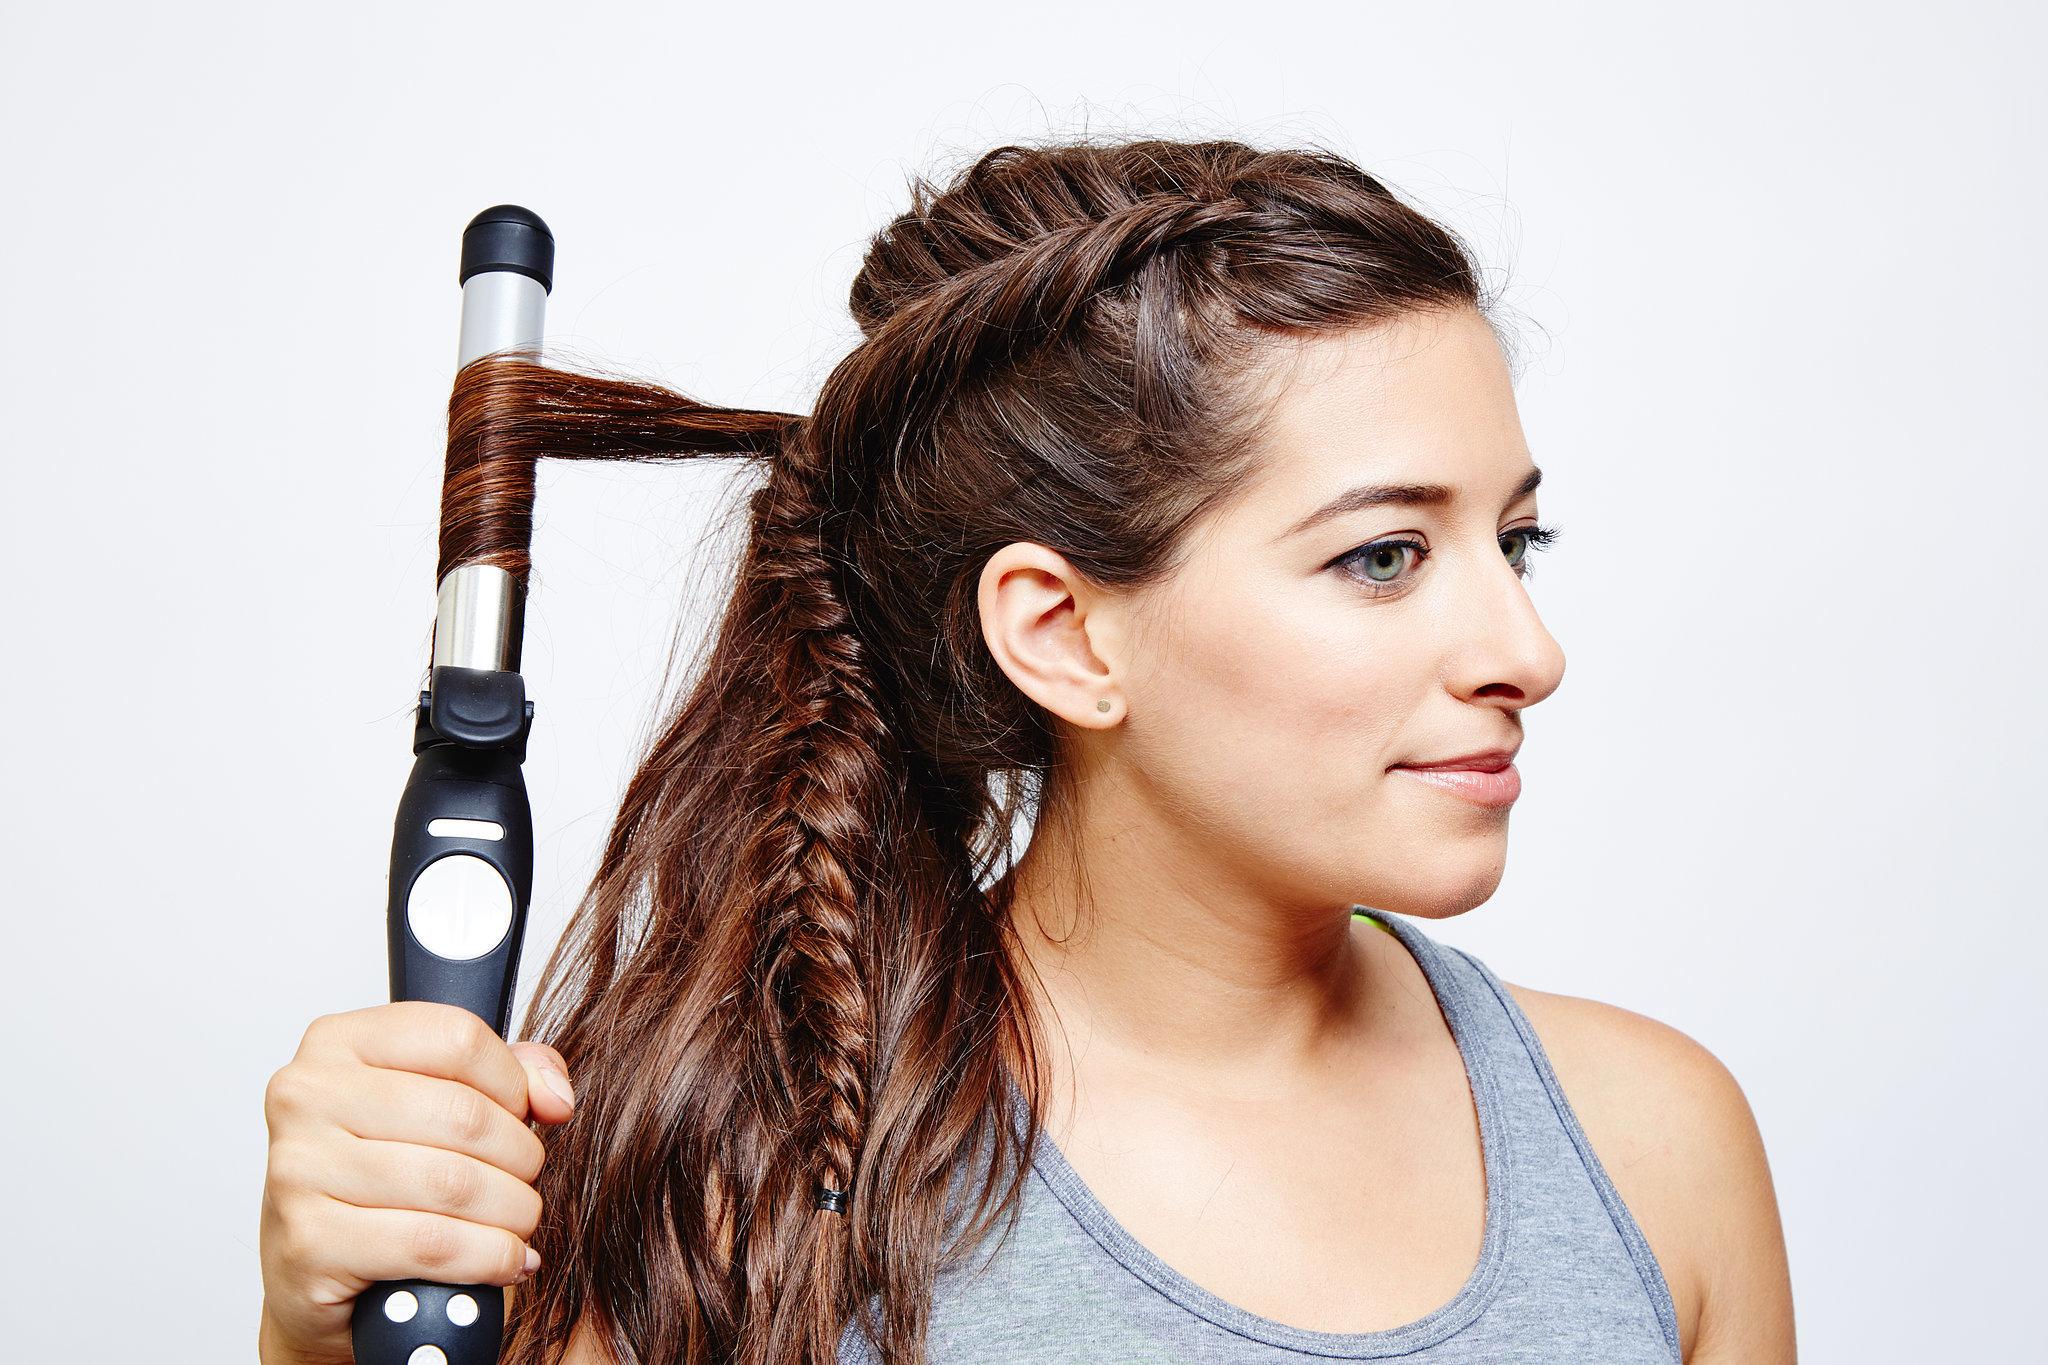 french-fishtail-ponytail-step-4.jpg